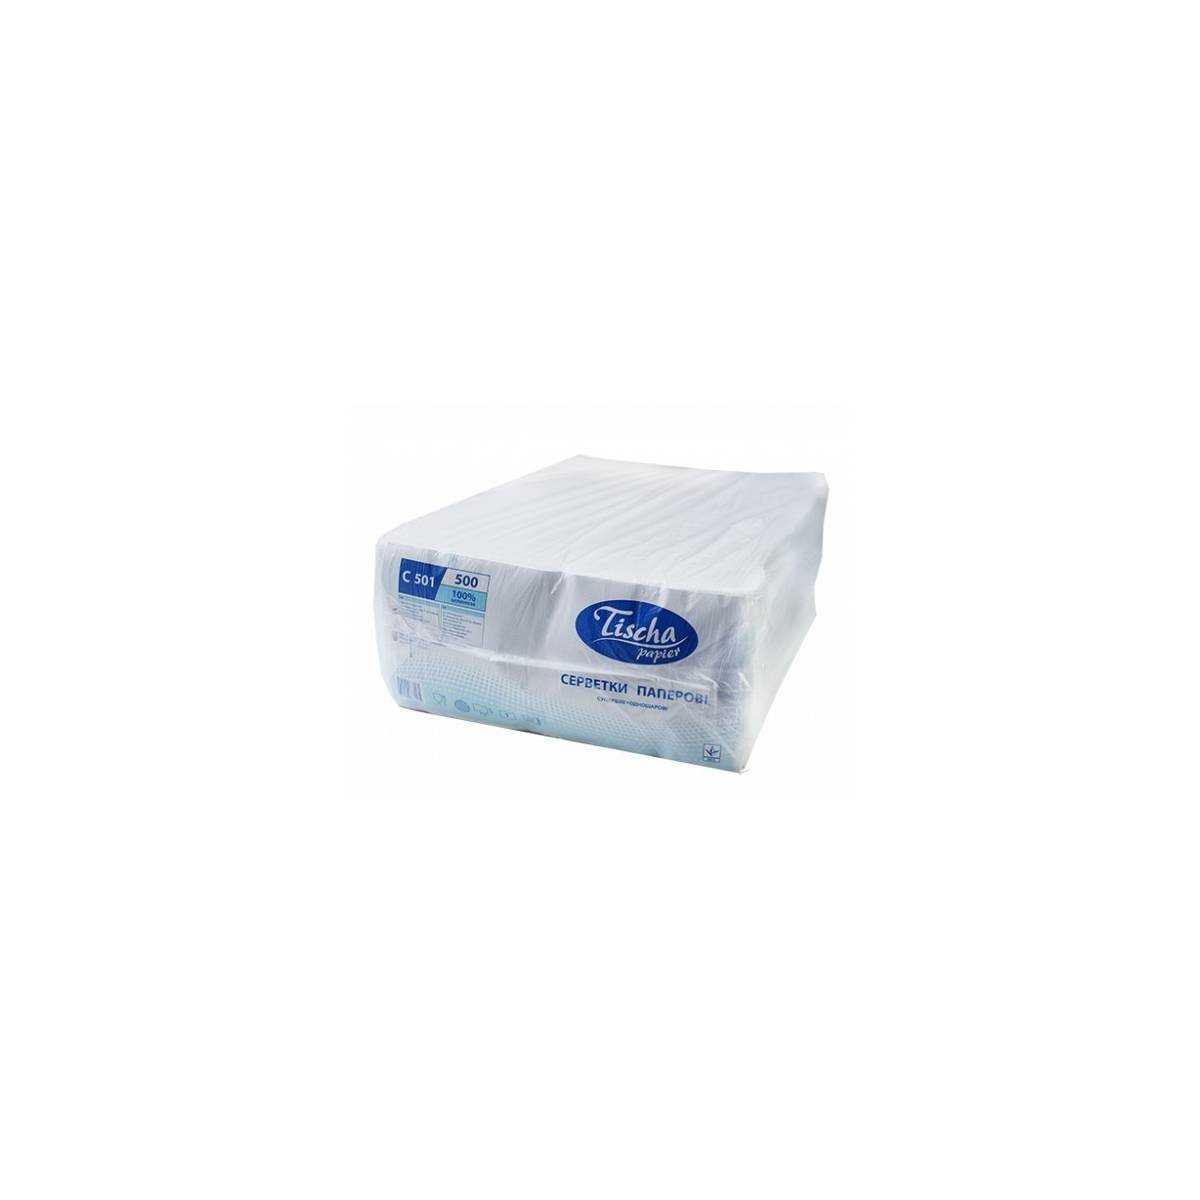 Салфетки столовые (C501) C501 Tischa Papier